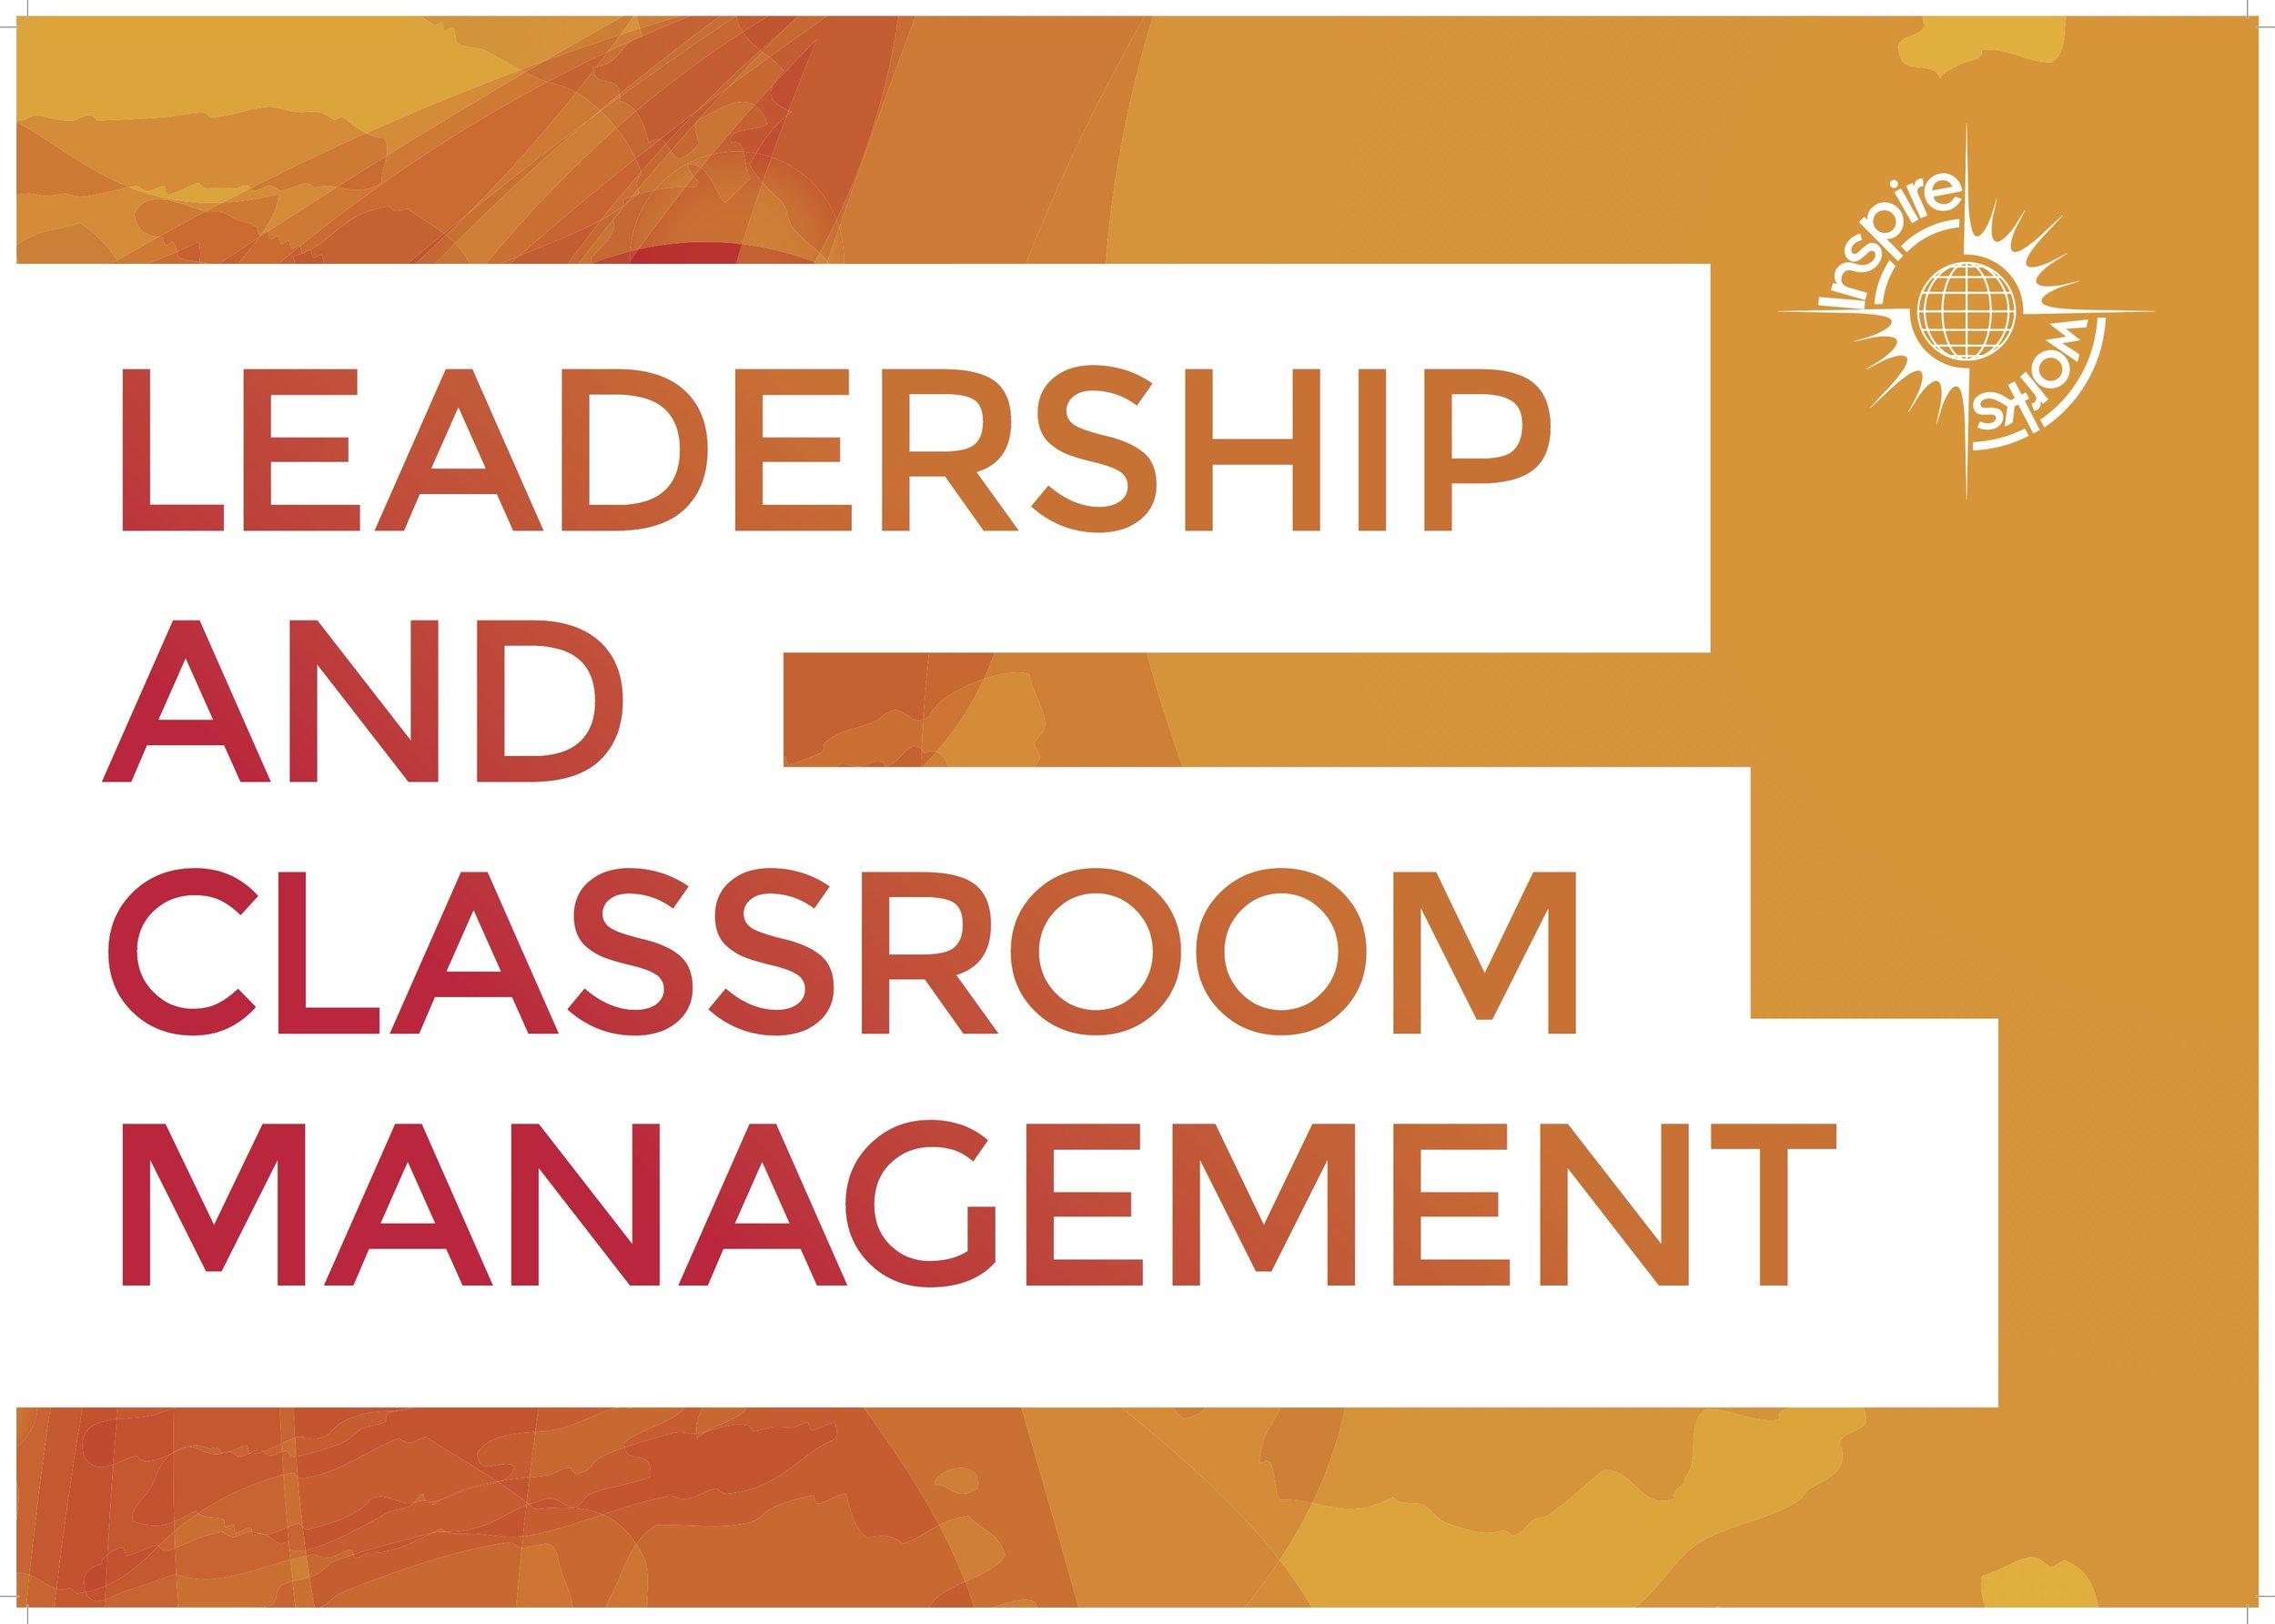 Leadership & Classroom Management.jpg